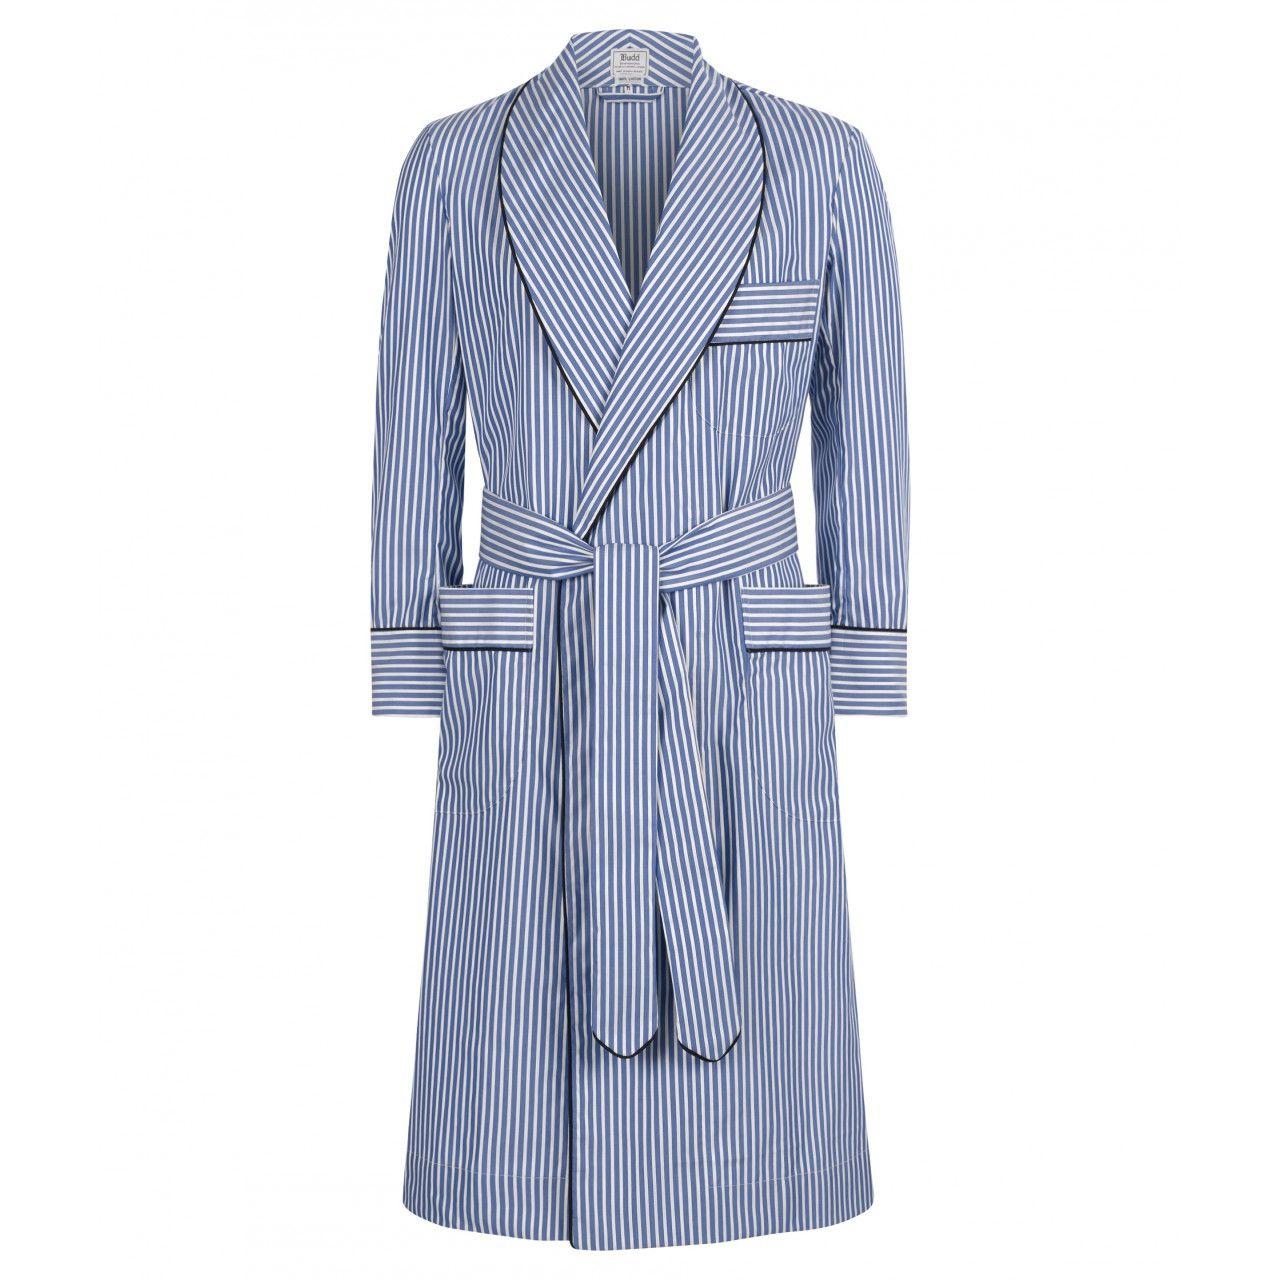 Edwardian Blue Budd Stripe Cotton Dressing Gown - Men's ...